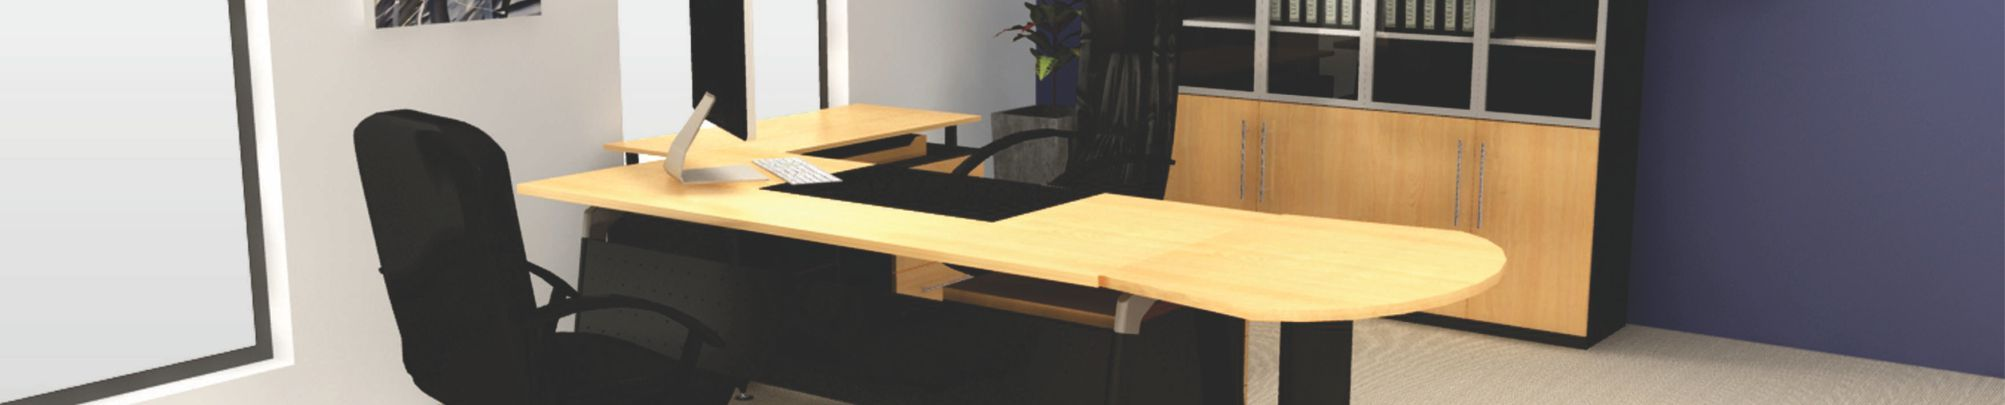 Deskstand Standing Desk Cape Town Www Deskstand Co Or Www Facebook To Purchase Diy Standing Desk Wooden Standing Desk Desk